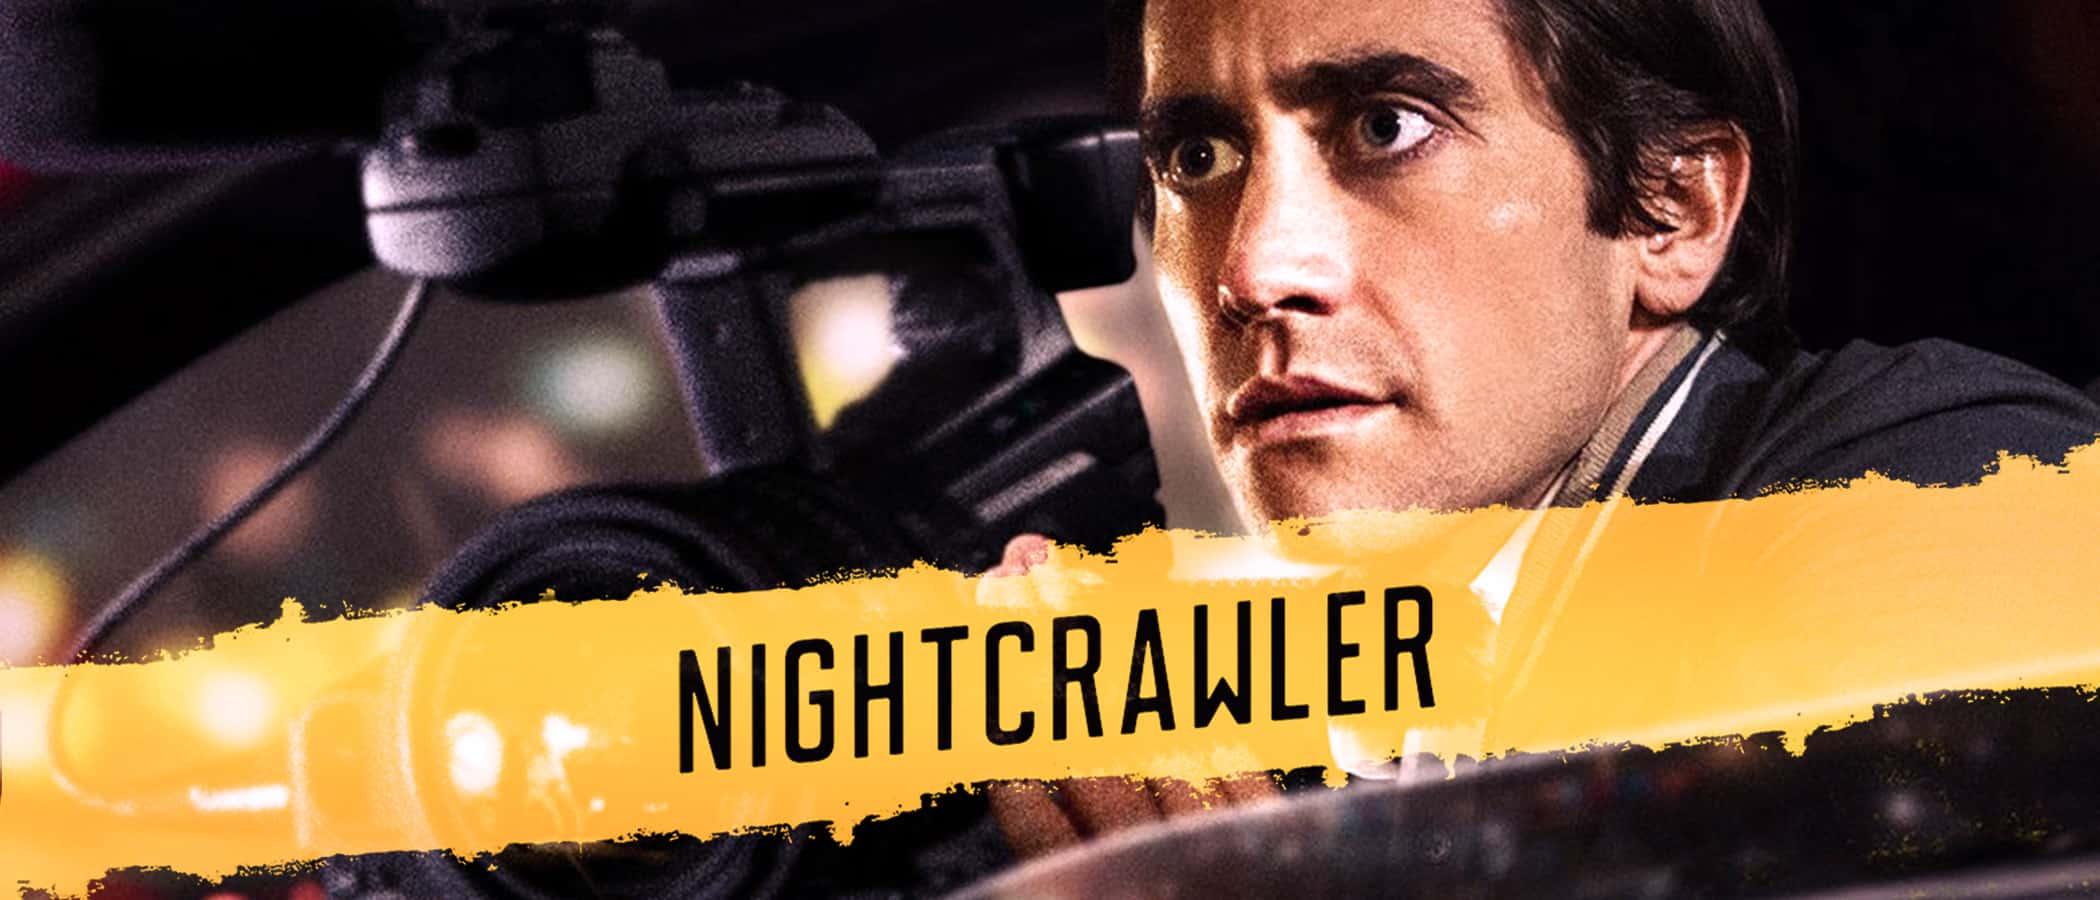 nightcrawler-hero2